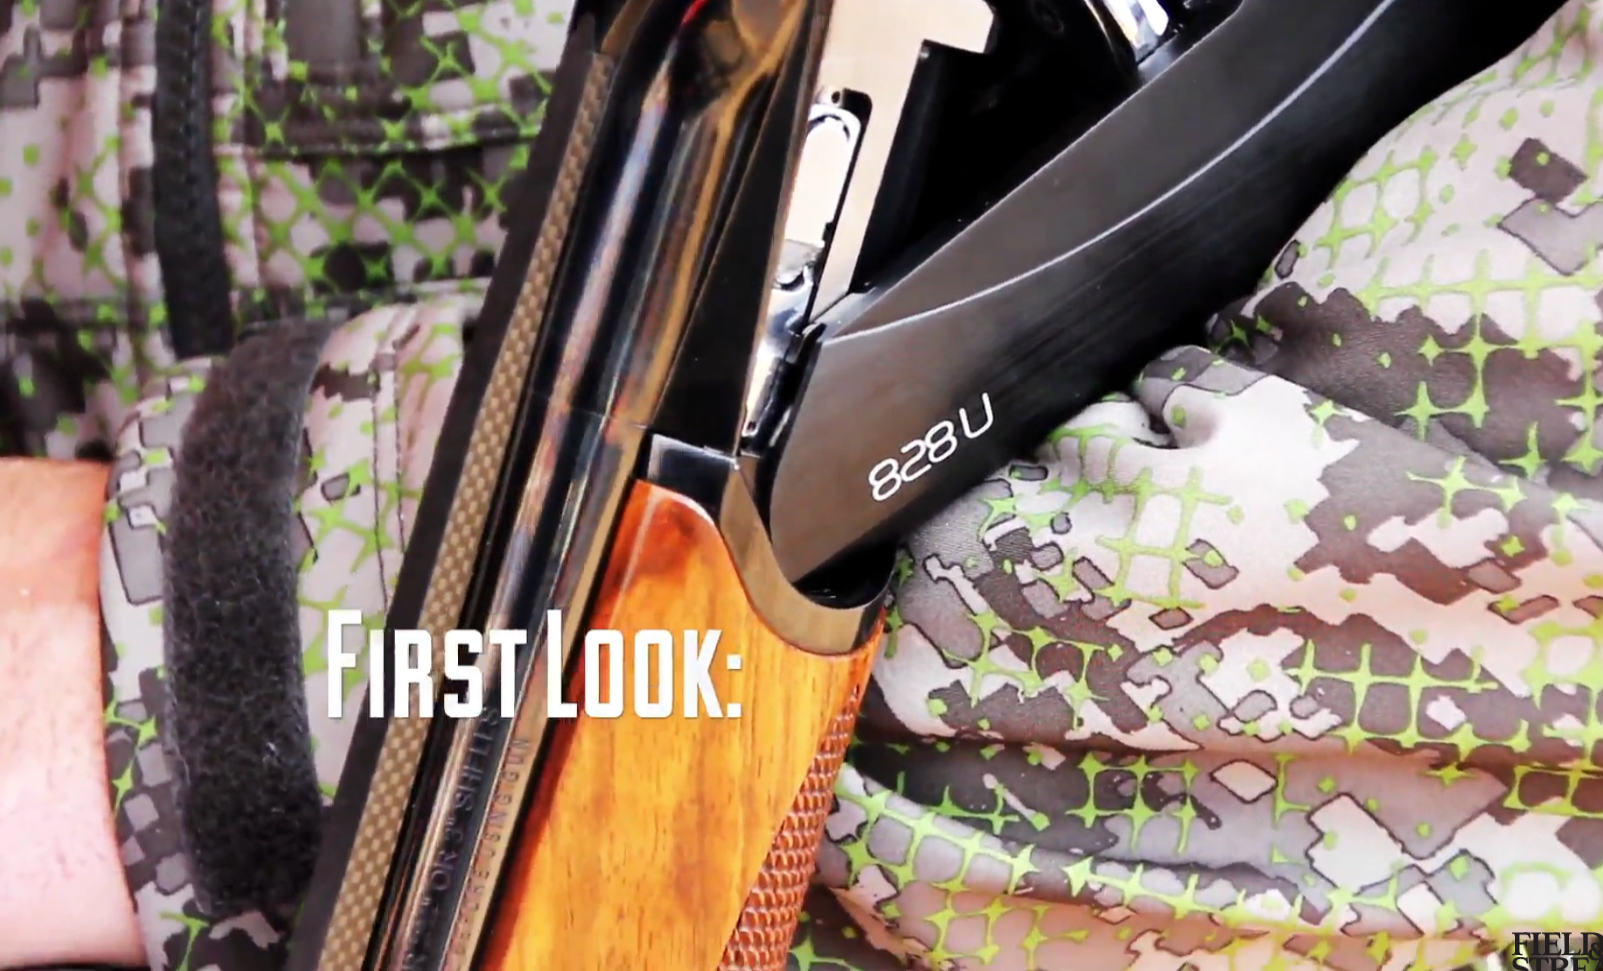 New Guns: 10 Best Shotguns of SHOT Show 2015